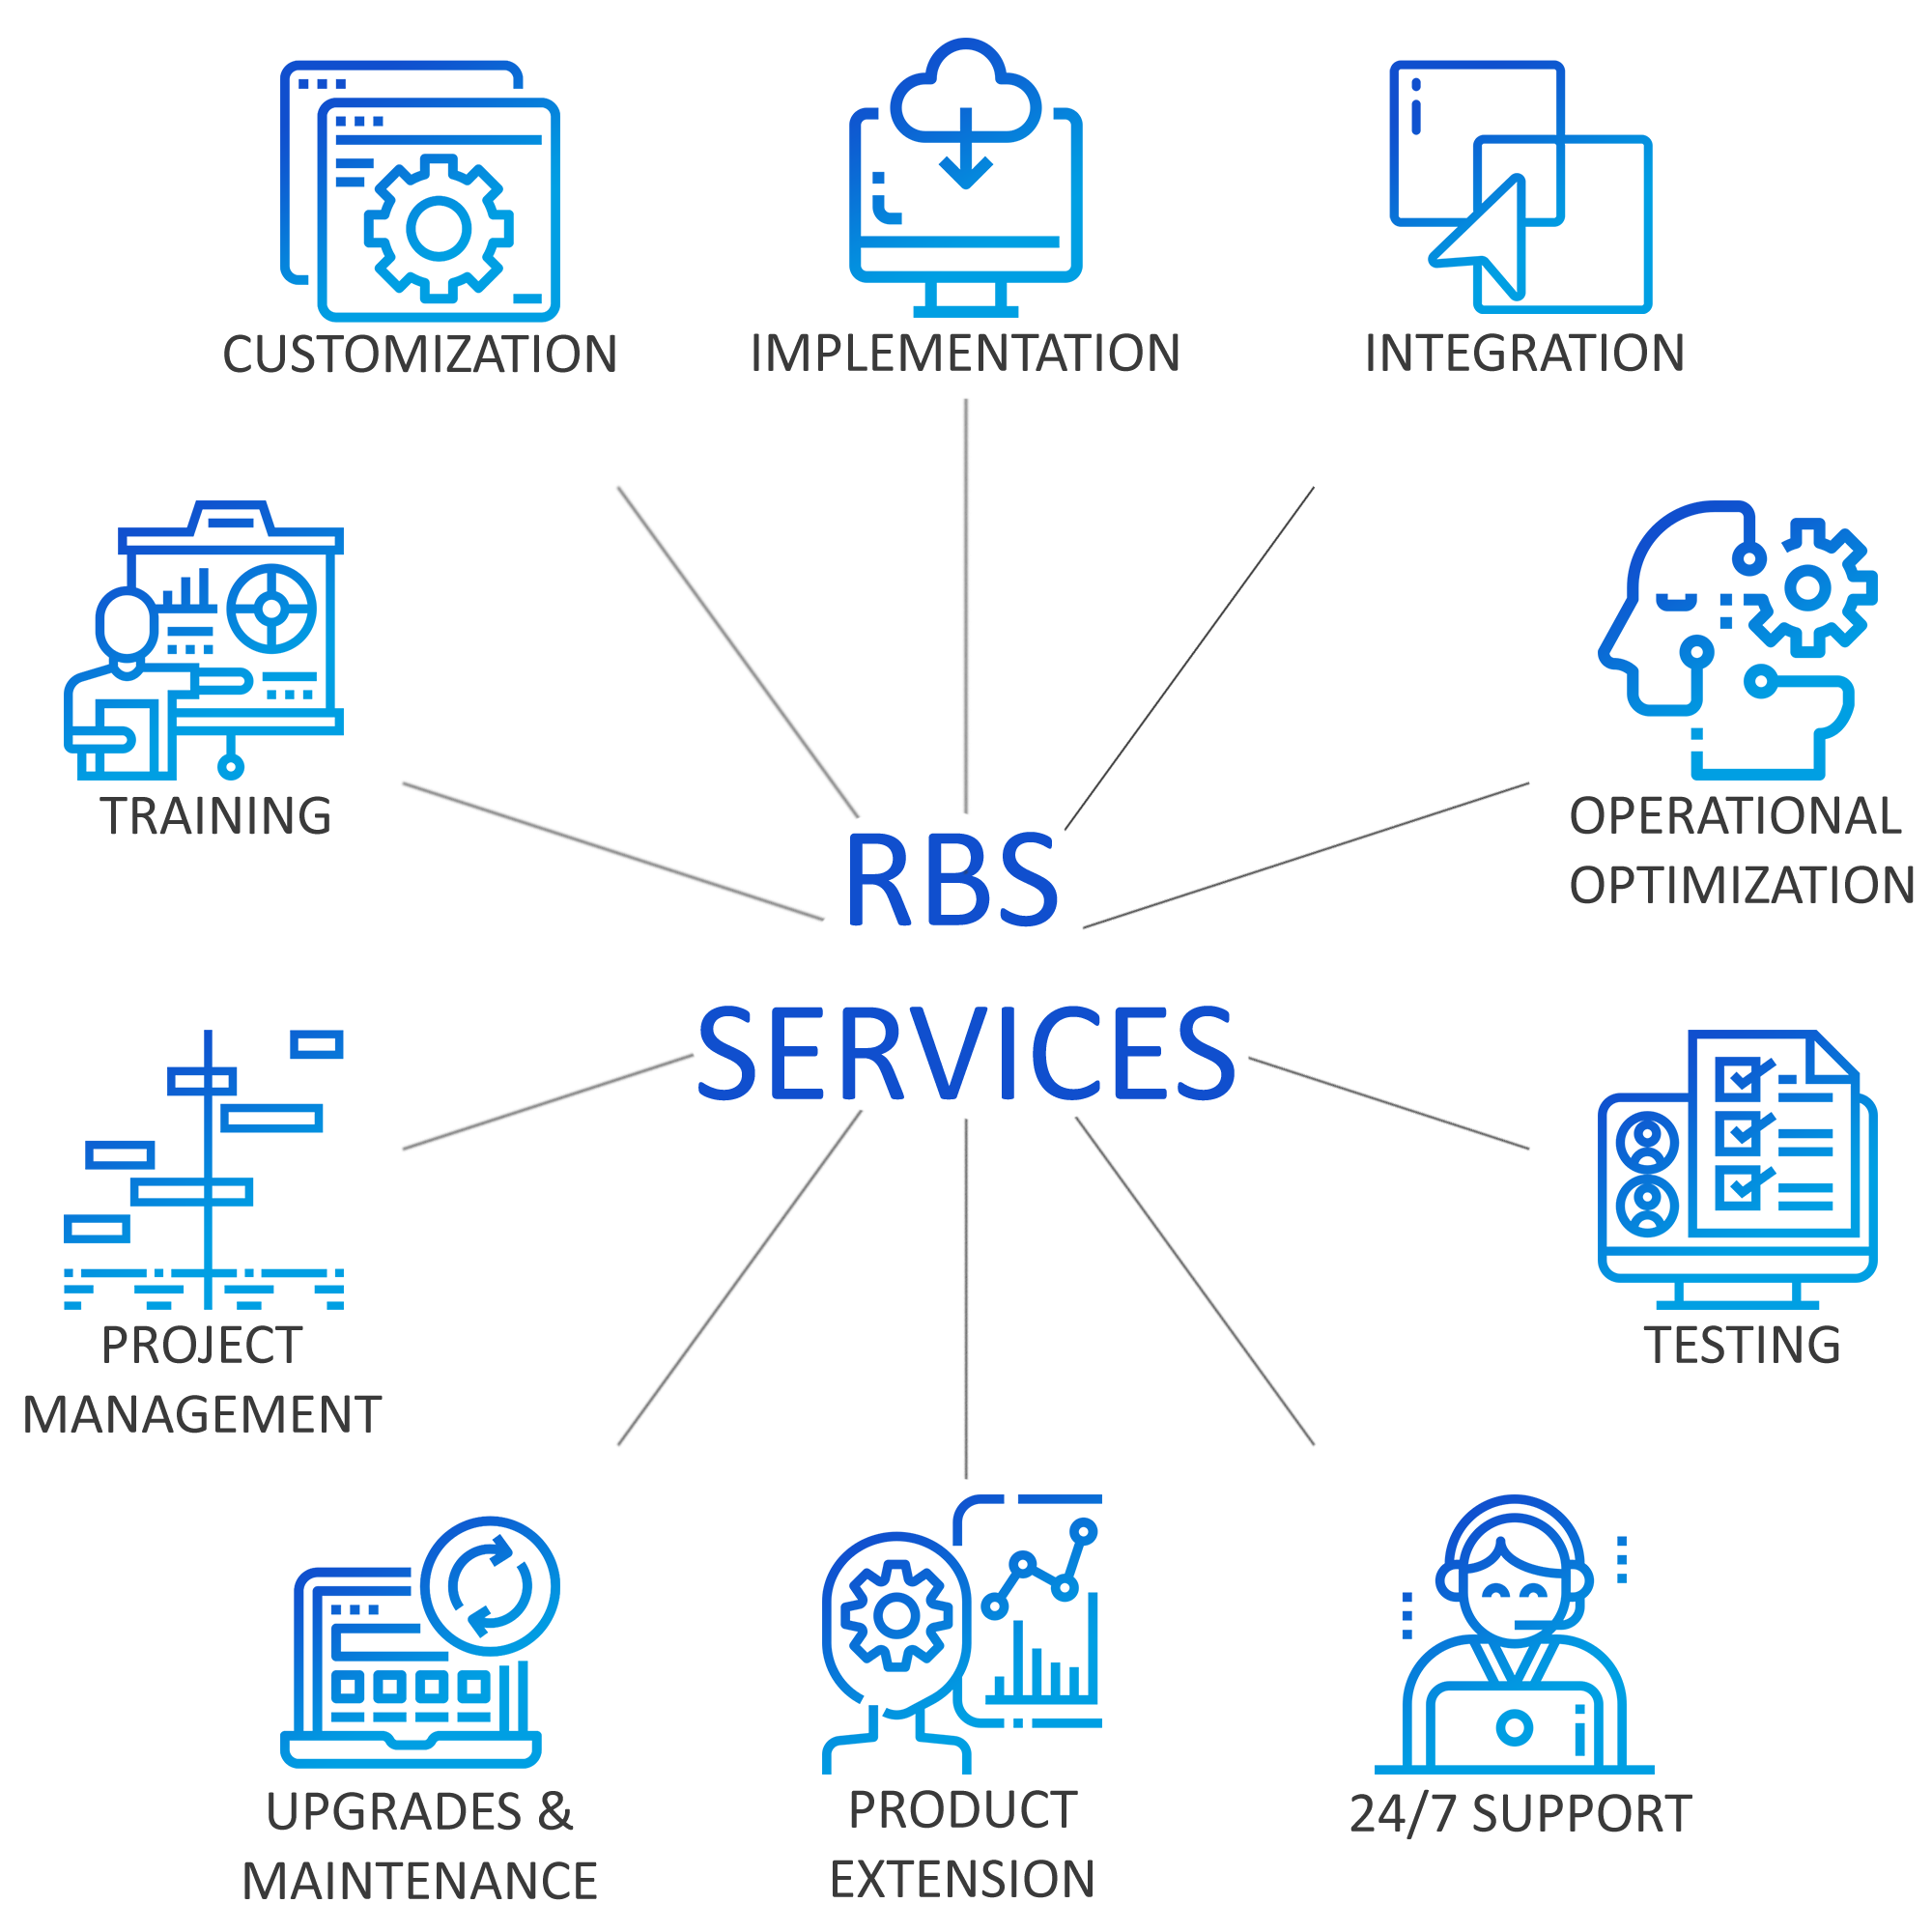 RBS Services